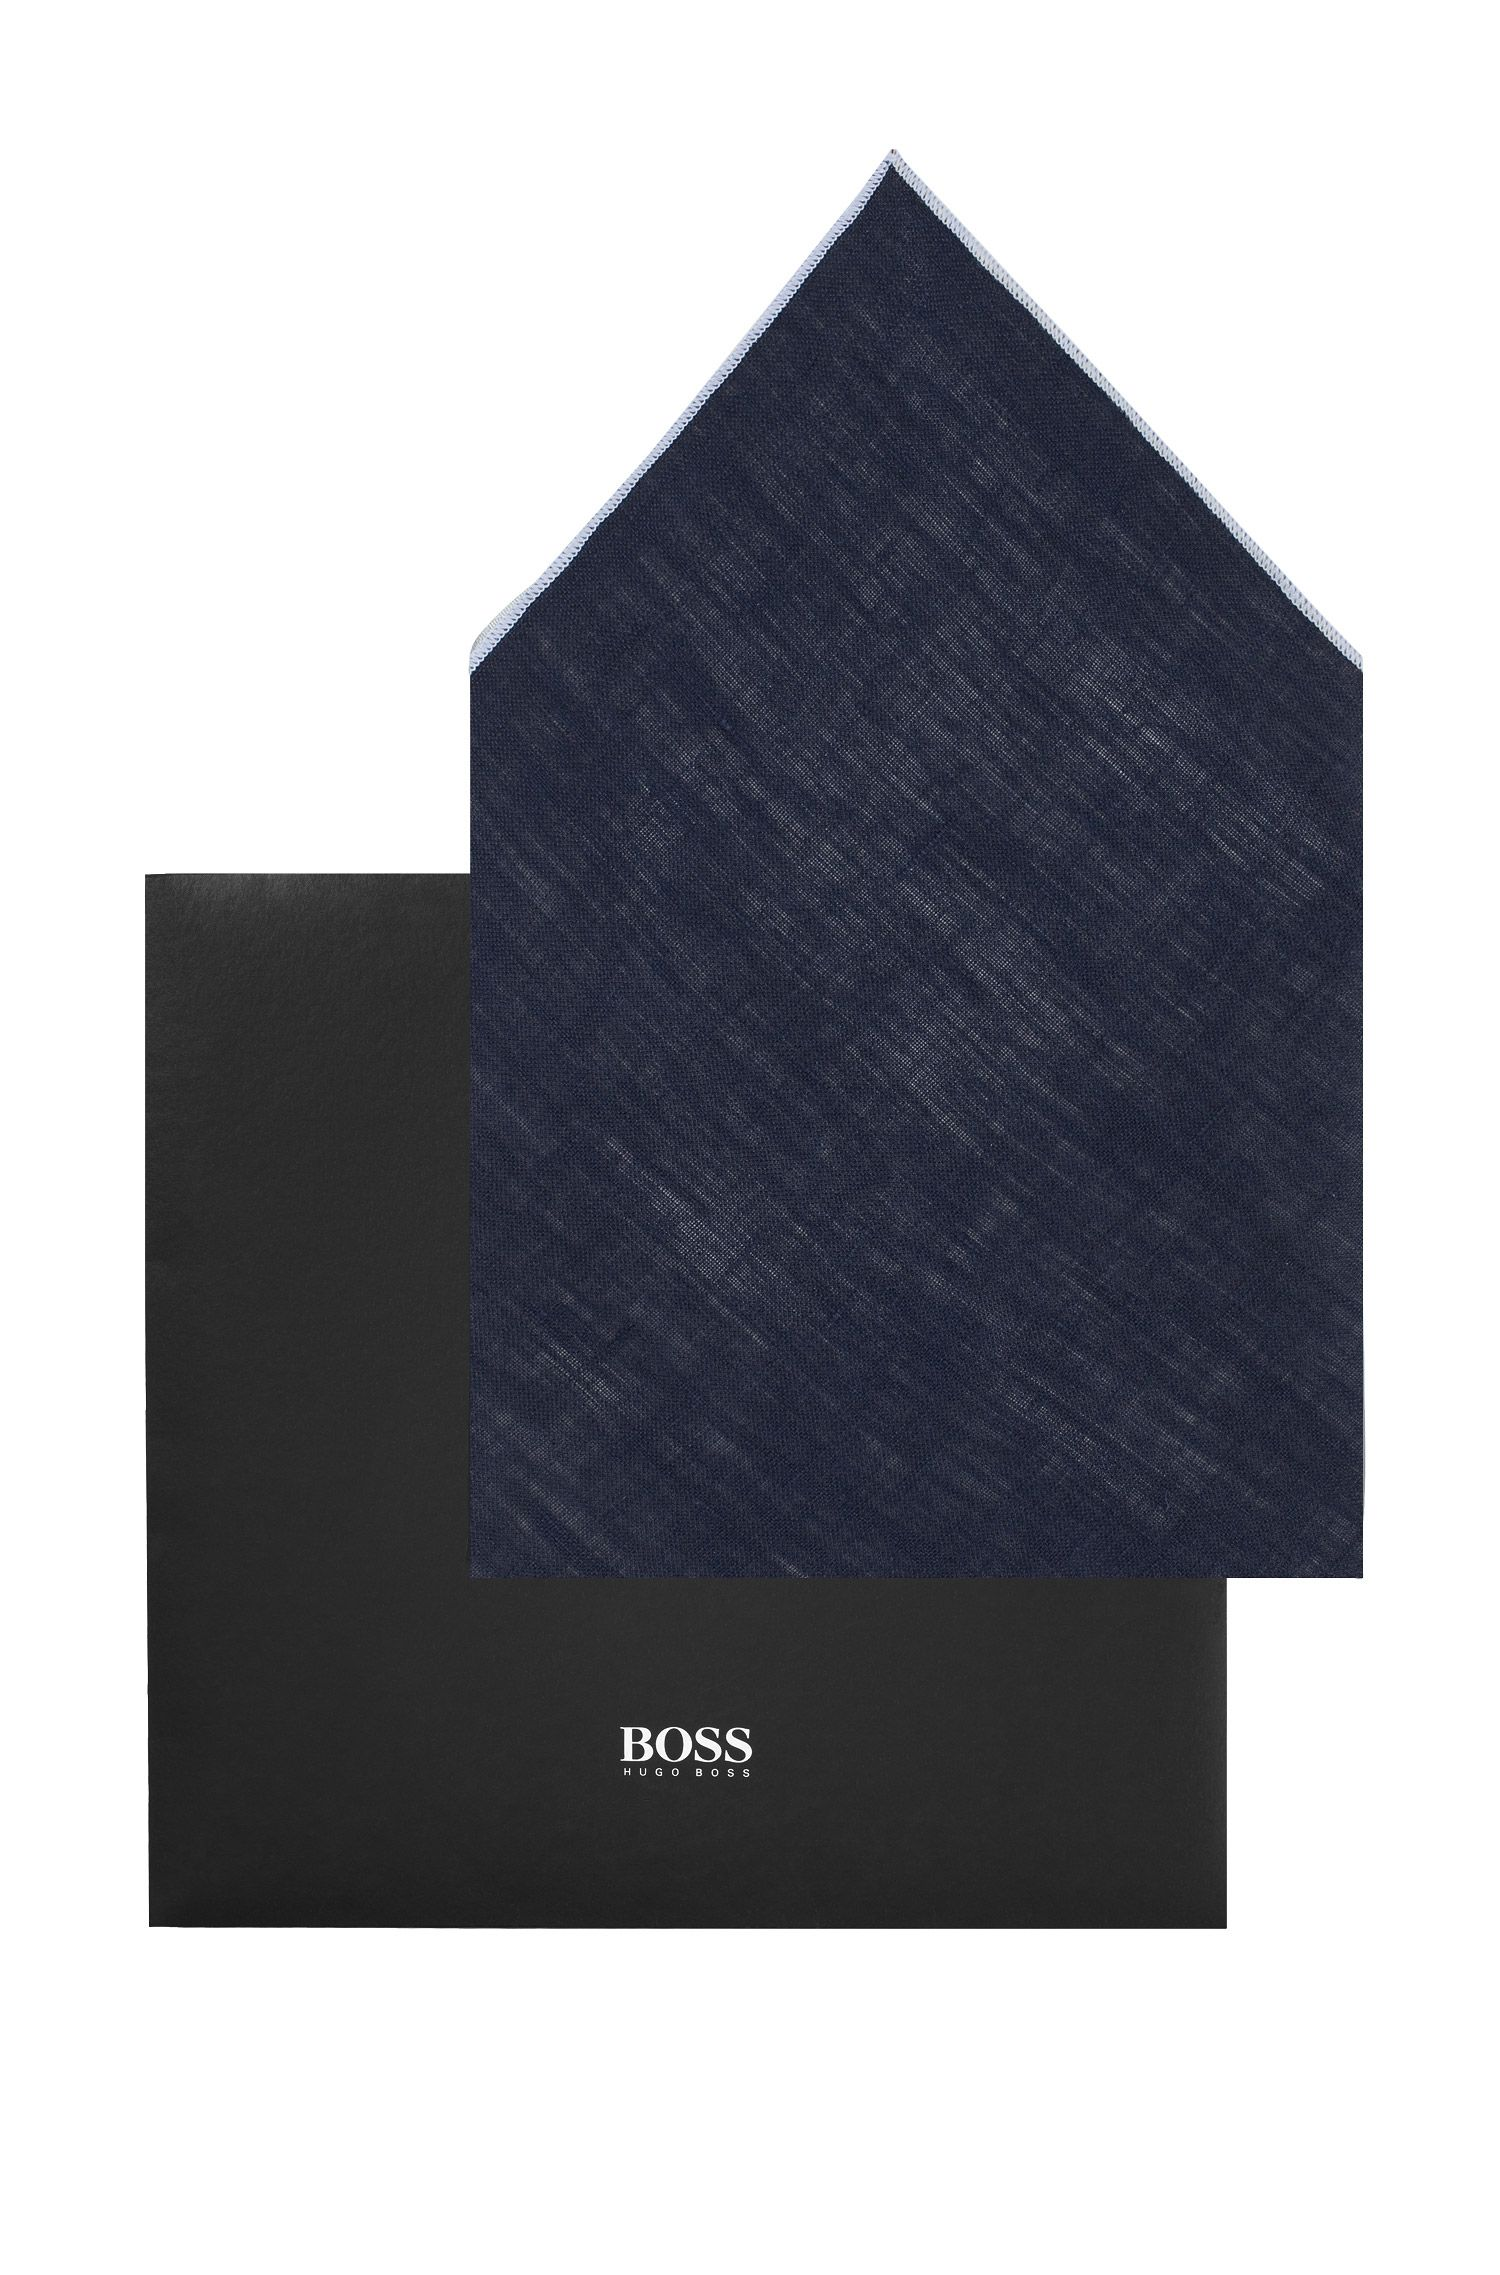 Pochette en lin, Pocket square 33 x 33